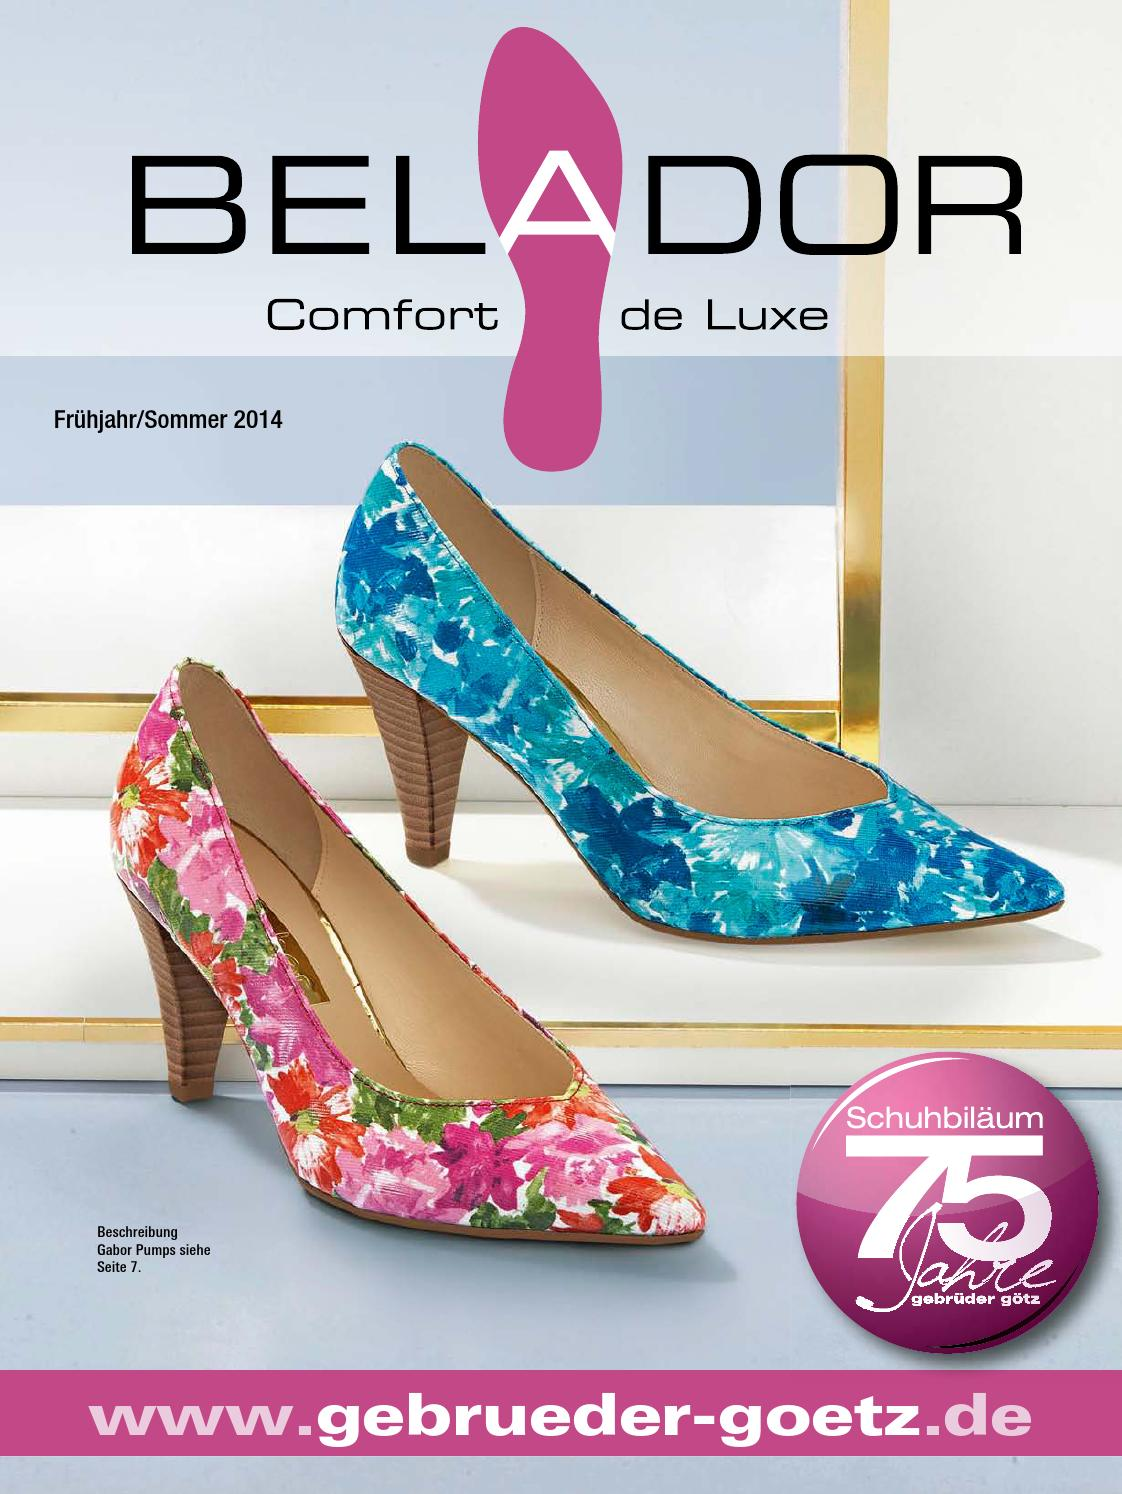 Details zu Pinke Pumps High Heels Extrem Hoch Plateau Nappaleder Made in Italy Gr. 36 46